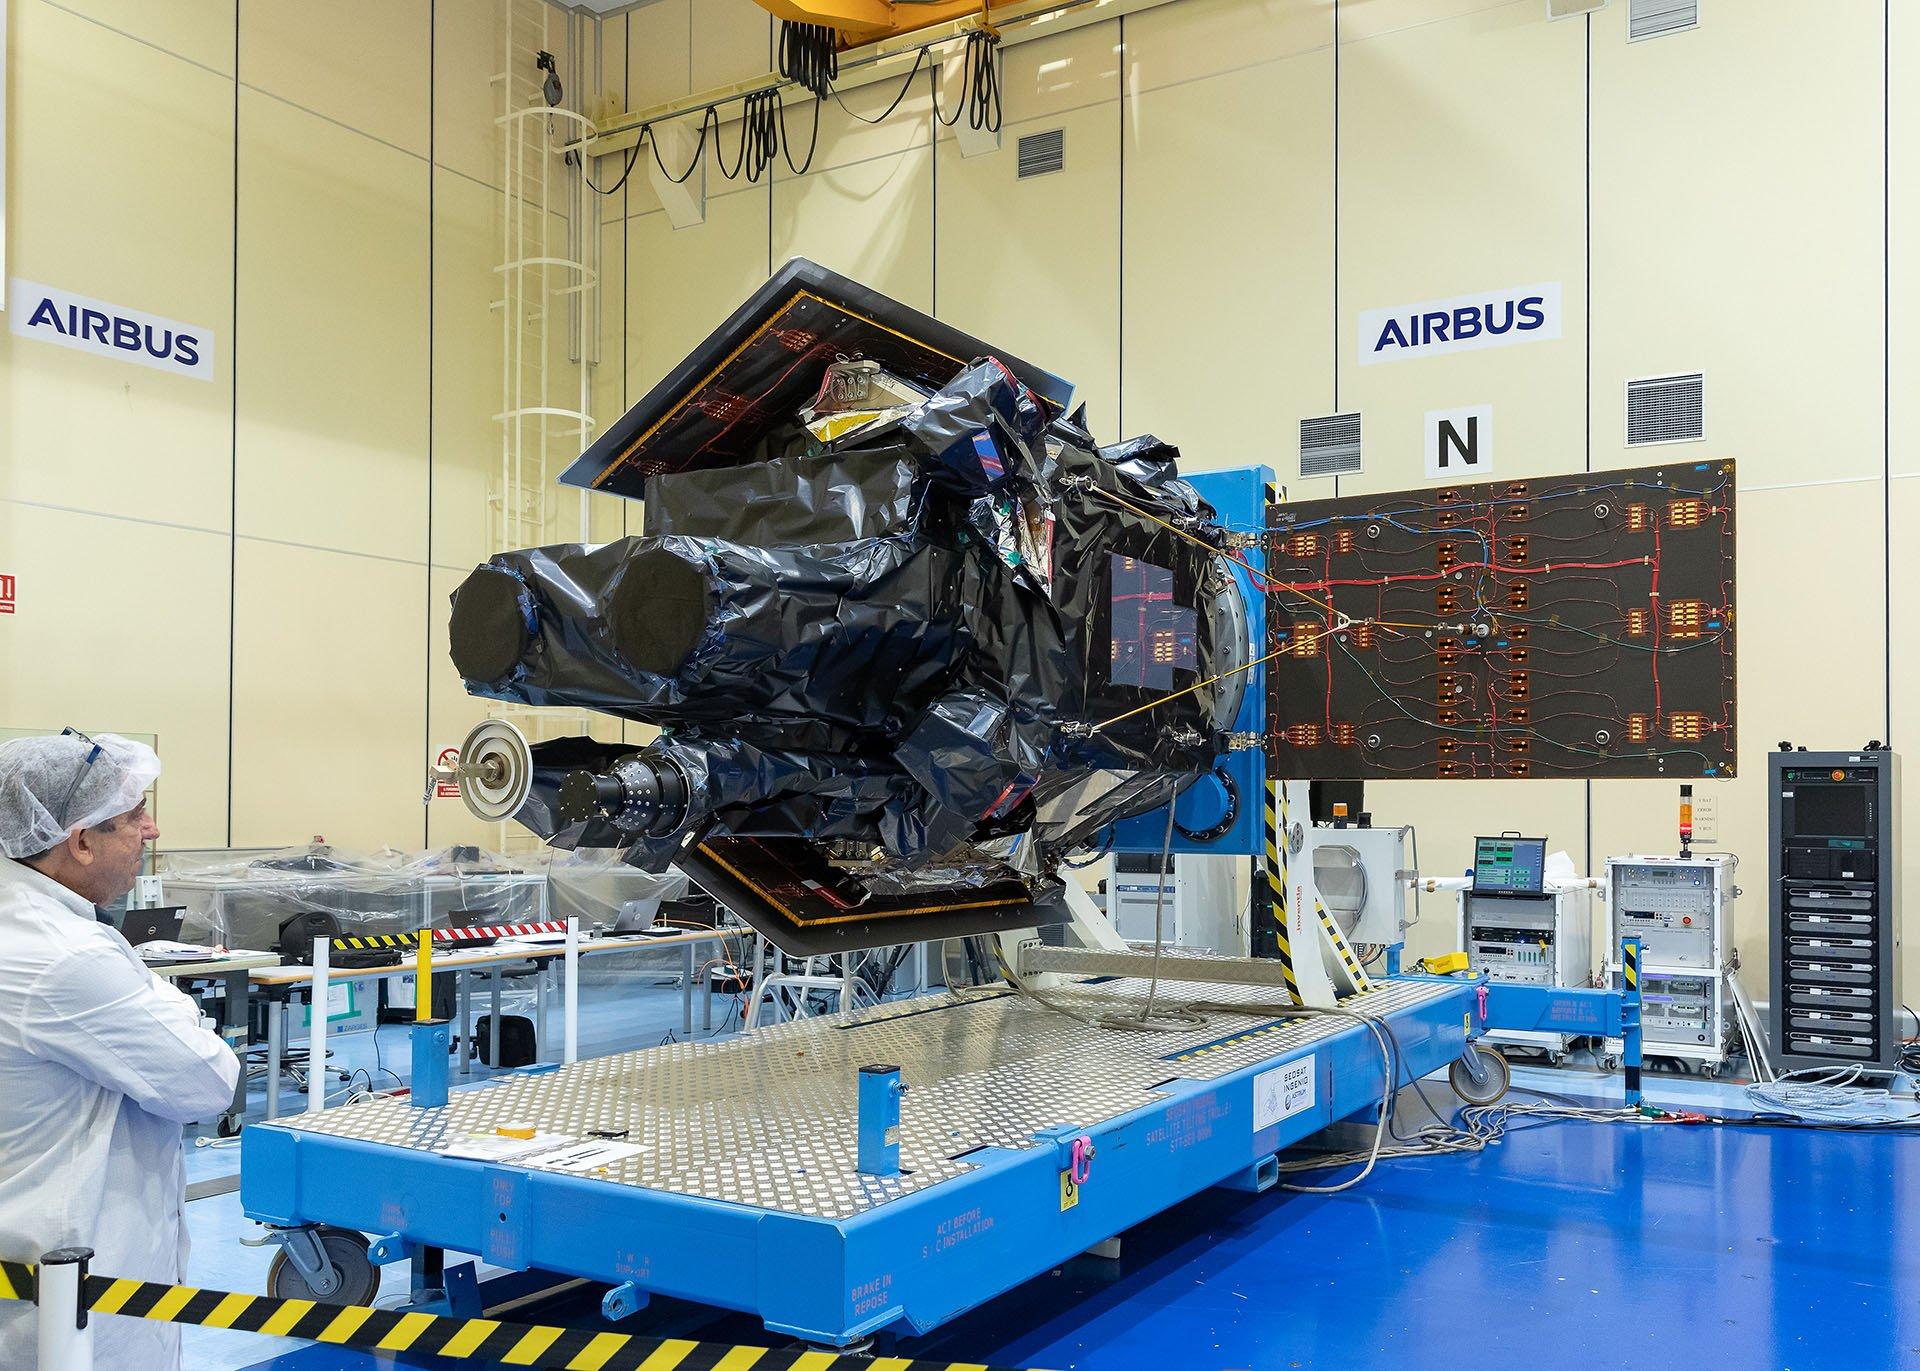 Vega VV17 (SEOSat-Ingenio & Taranis) - CSG - 17.11.2020 - Echec ! 1_jfif89